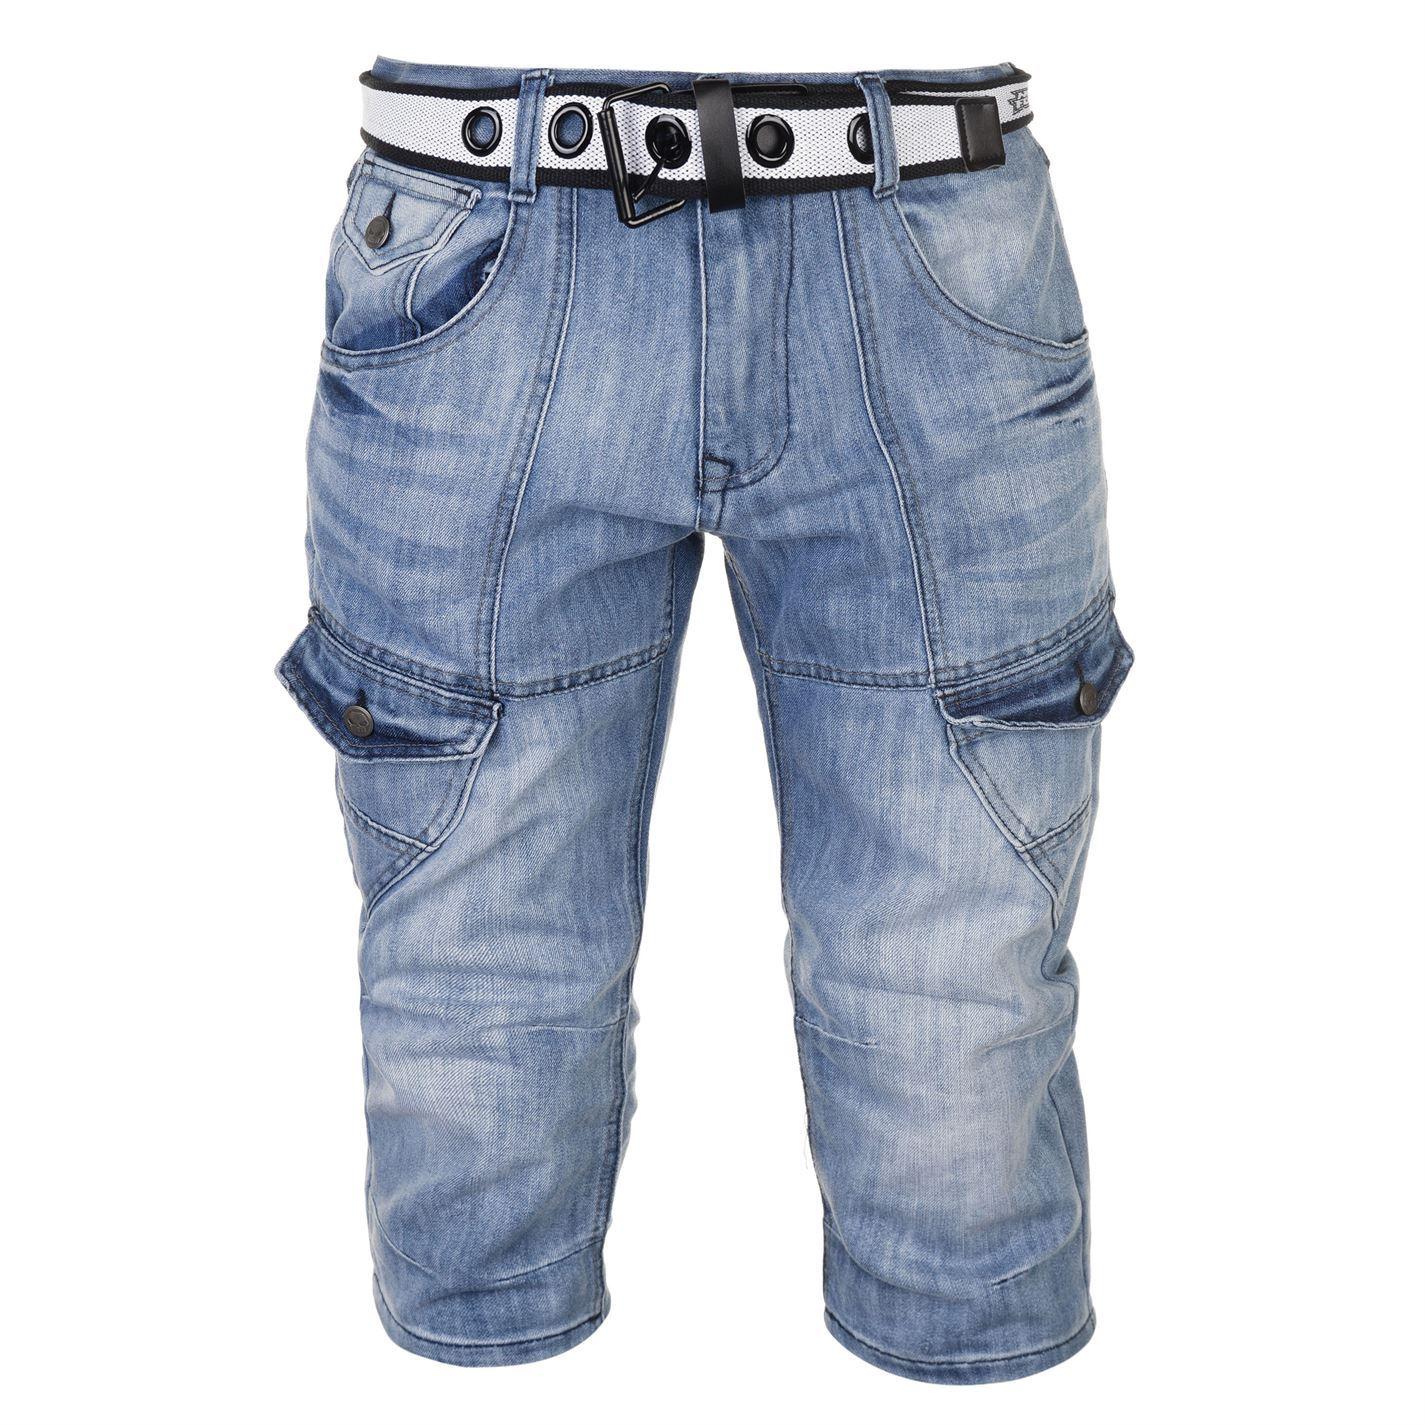 No-Fear-Belted-Cargo-Shorts-Mens-Bottoms-Short-Pants-Summerwear thumbnail 11